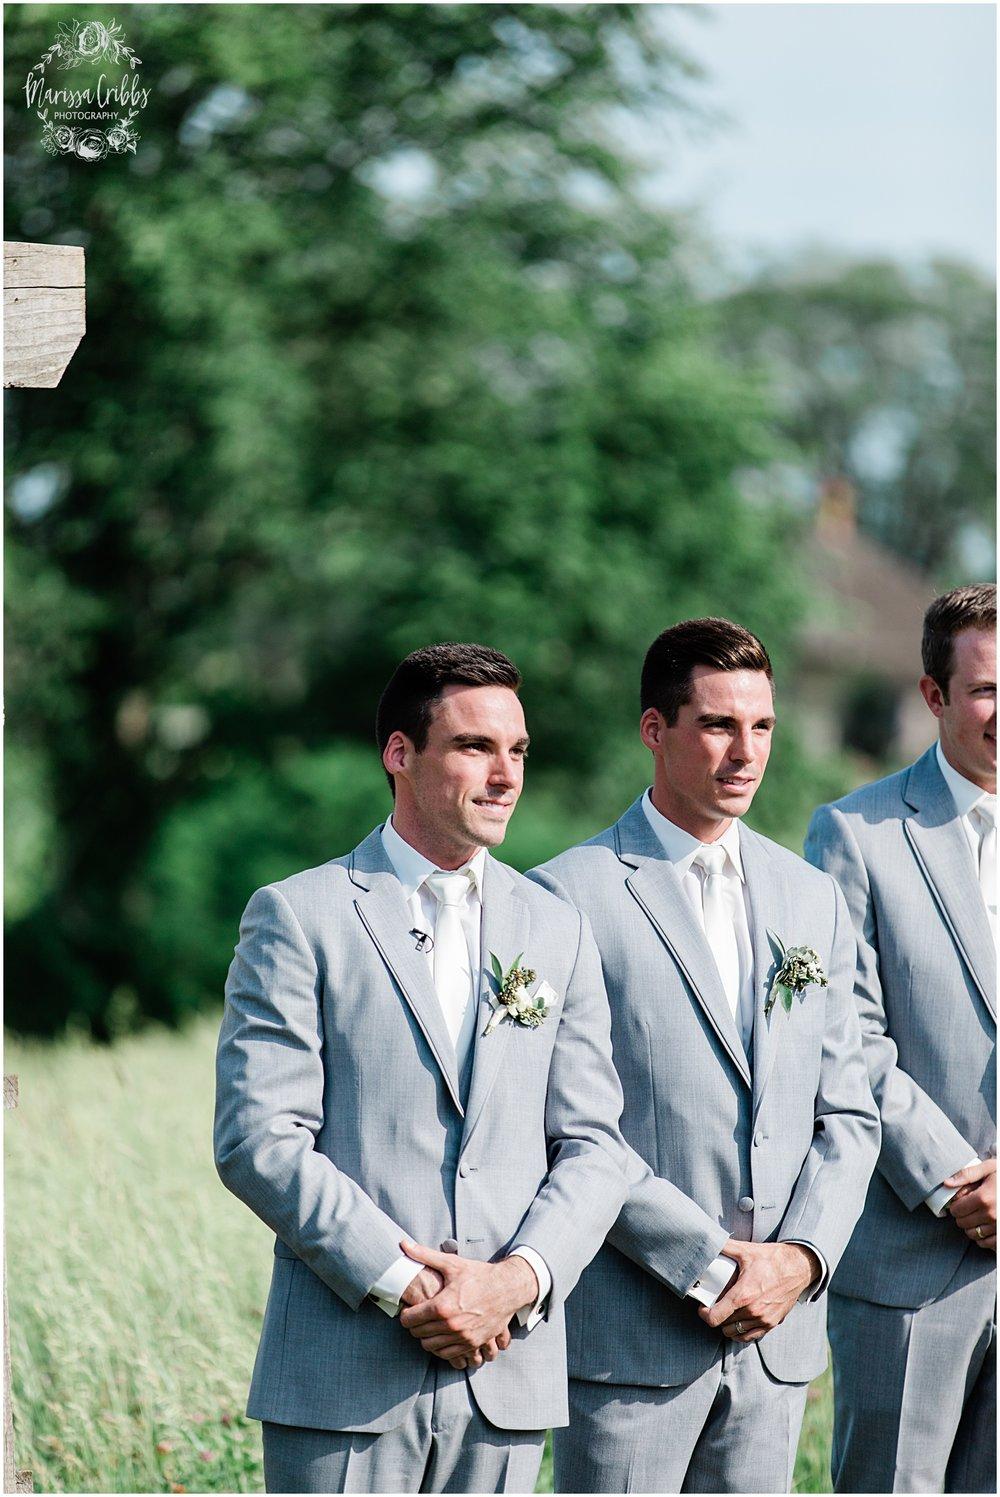 RHODES WEDDING | WESTON RED BARN FARM | MARISSA CRIBBS PHOTOGRAPHY_5272.jpg